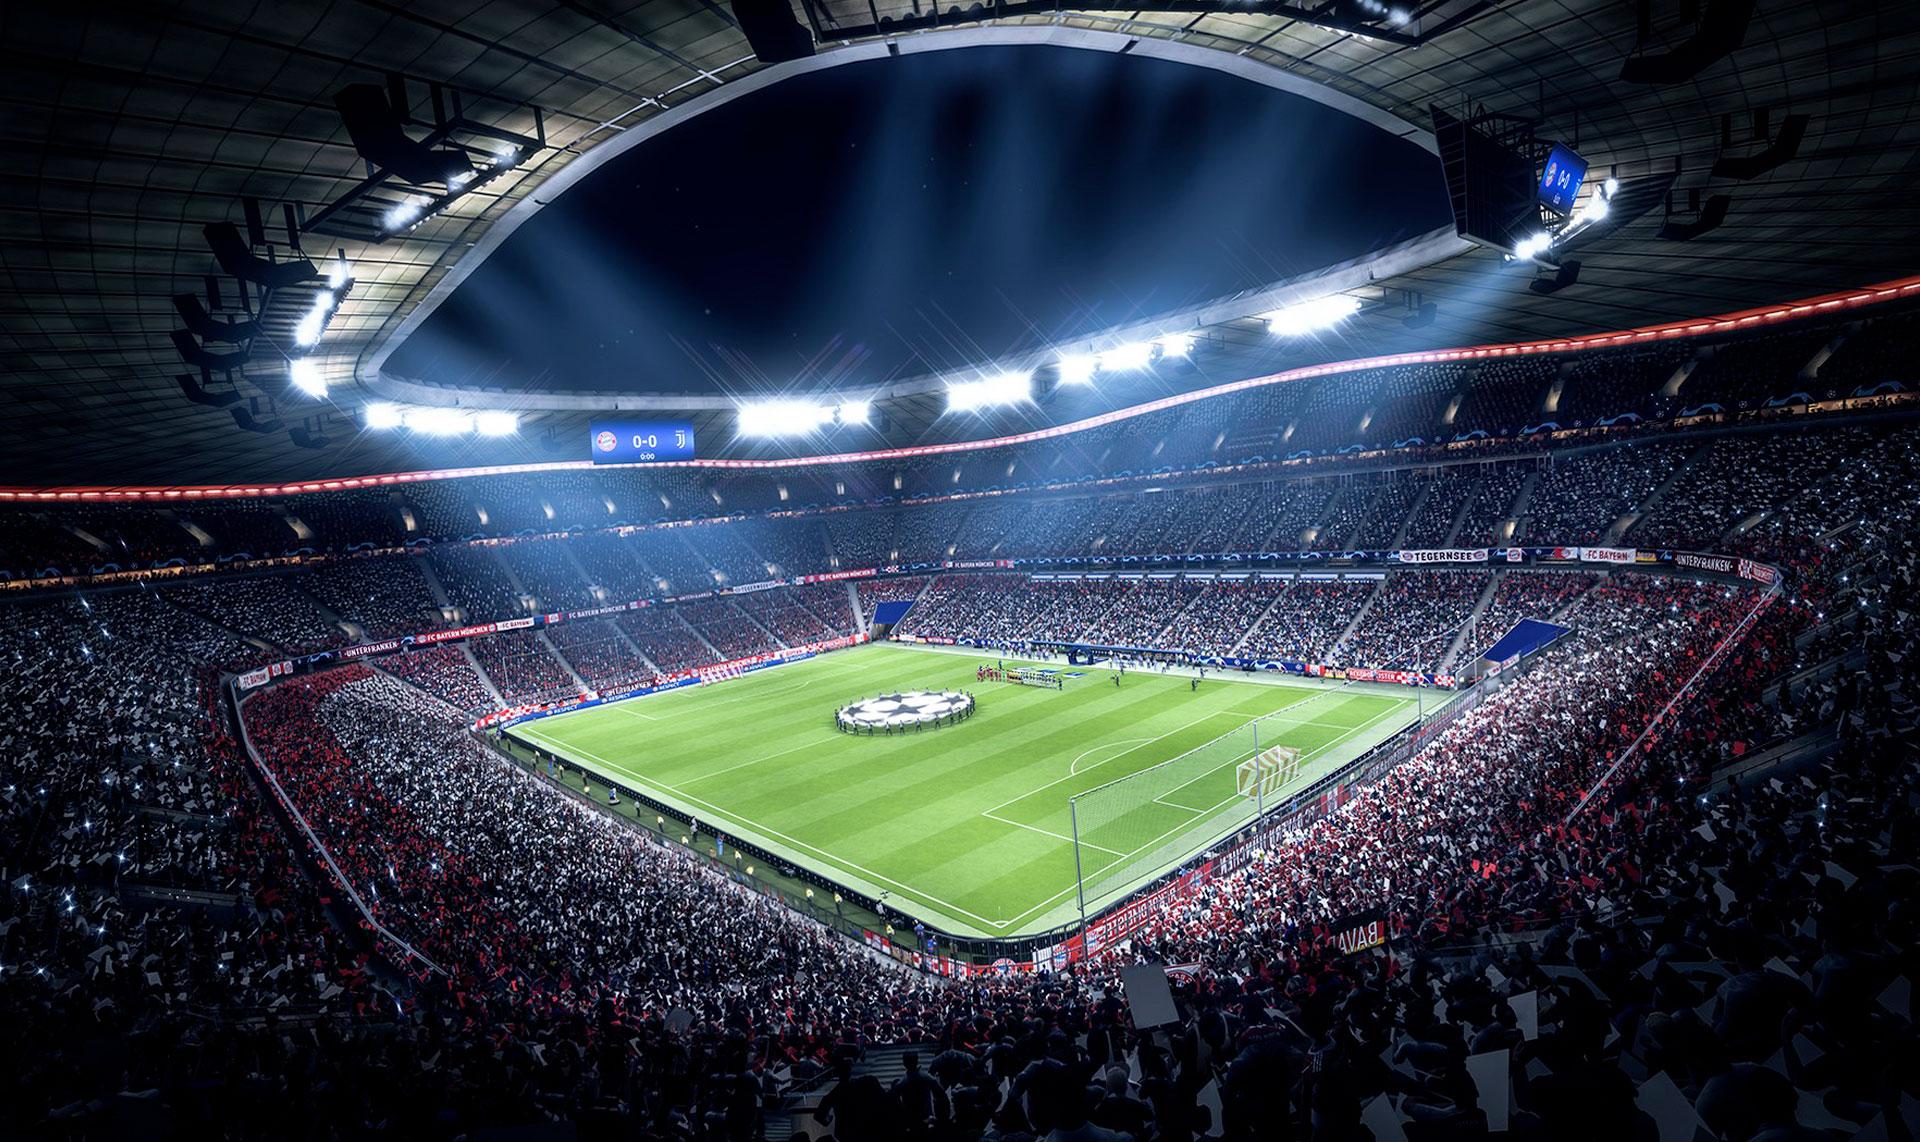 https://www.mundomex.com.mx/sites/default/files/revslider/image/futbol-soccer.jpg